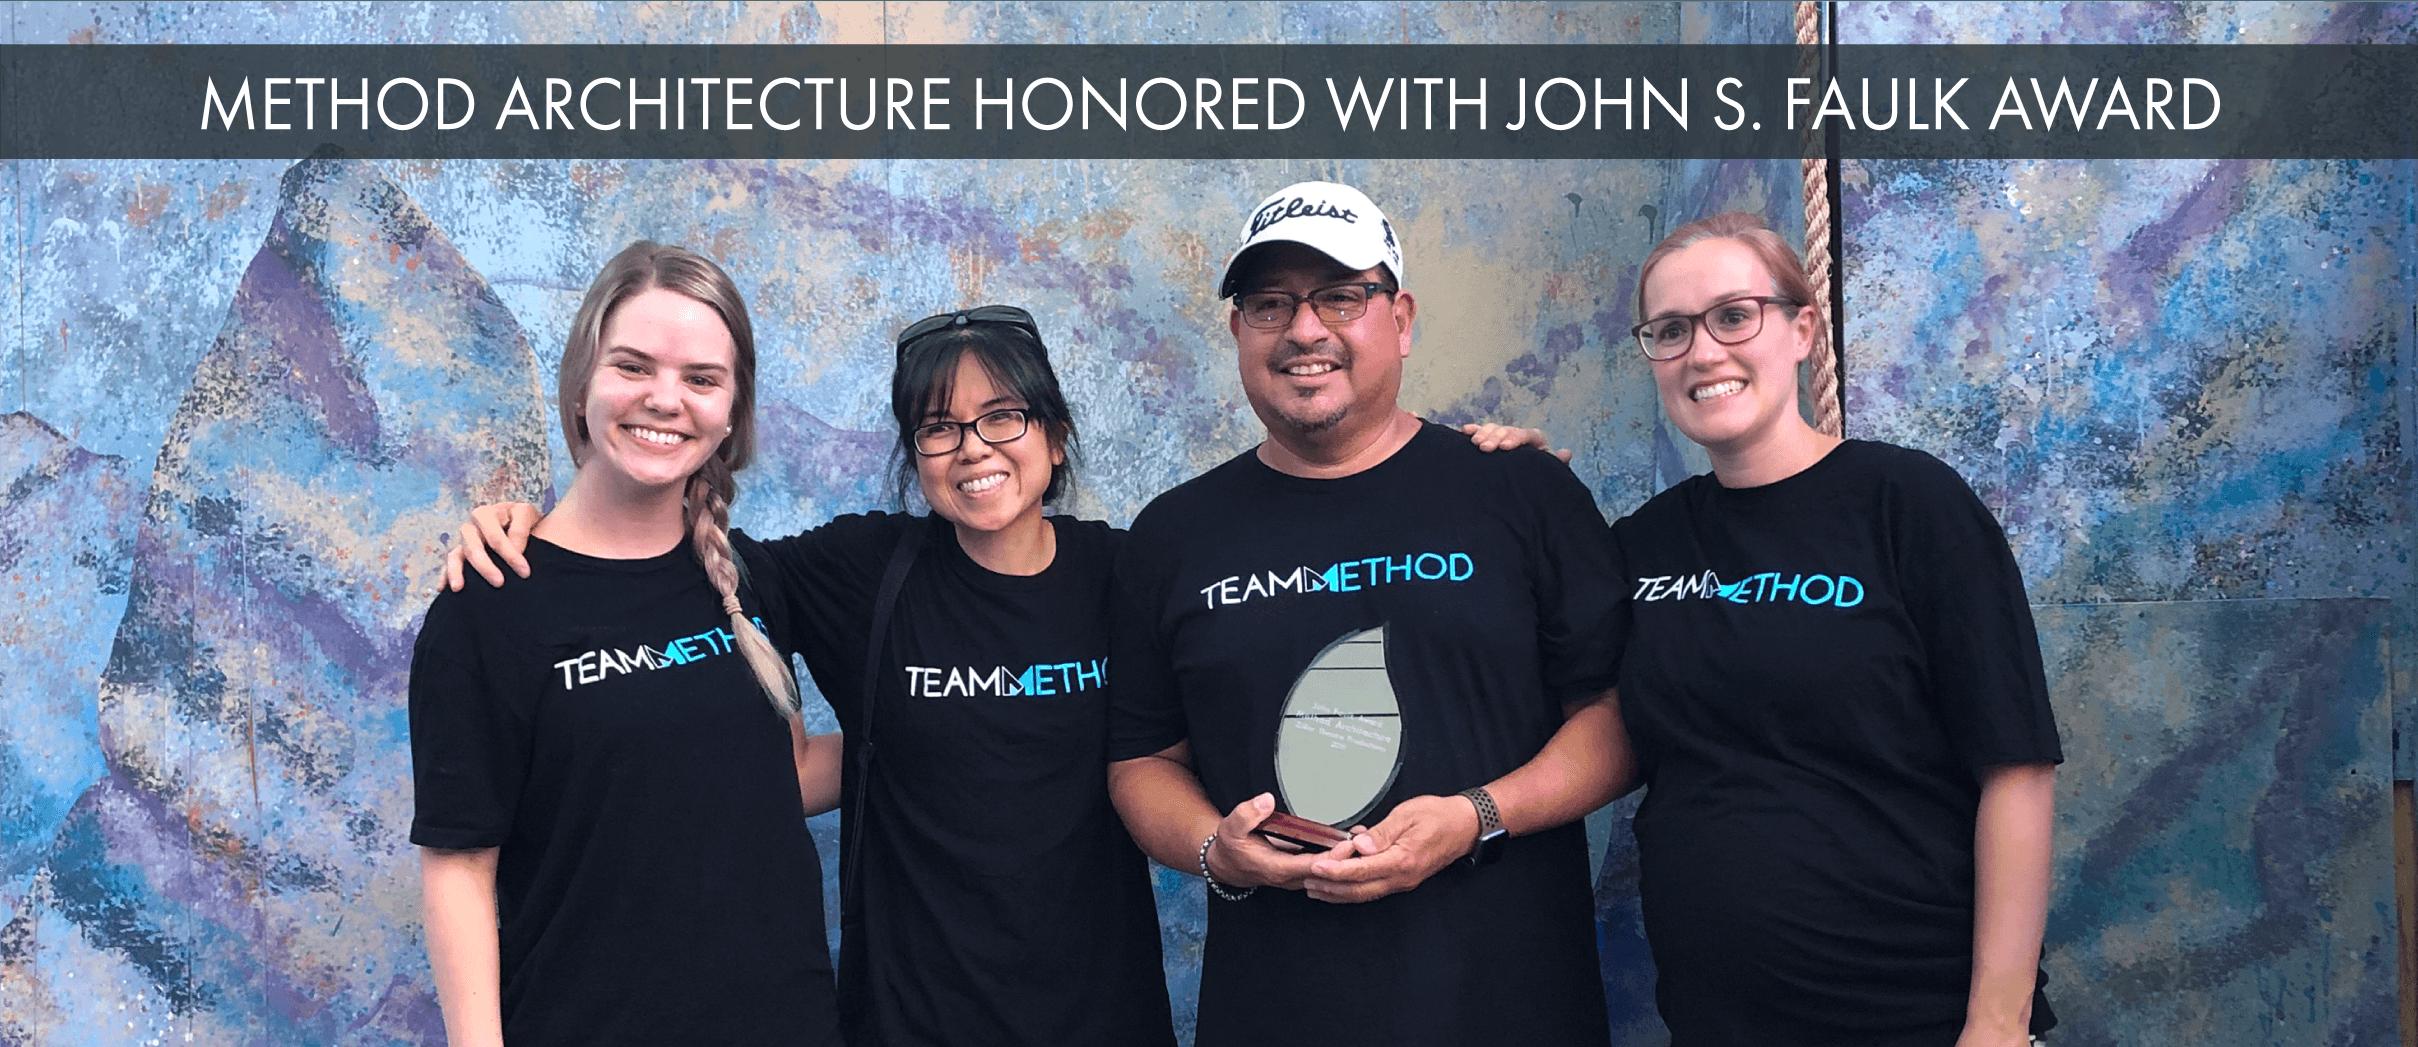 Method Architecture Awarded the John S. Faulk Award